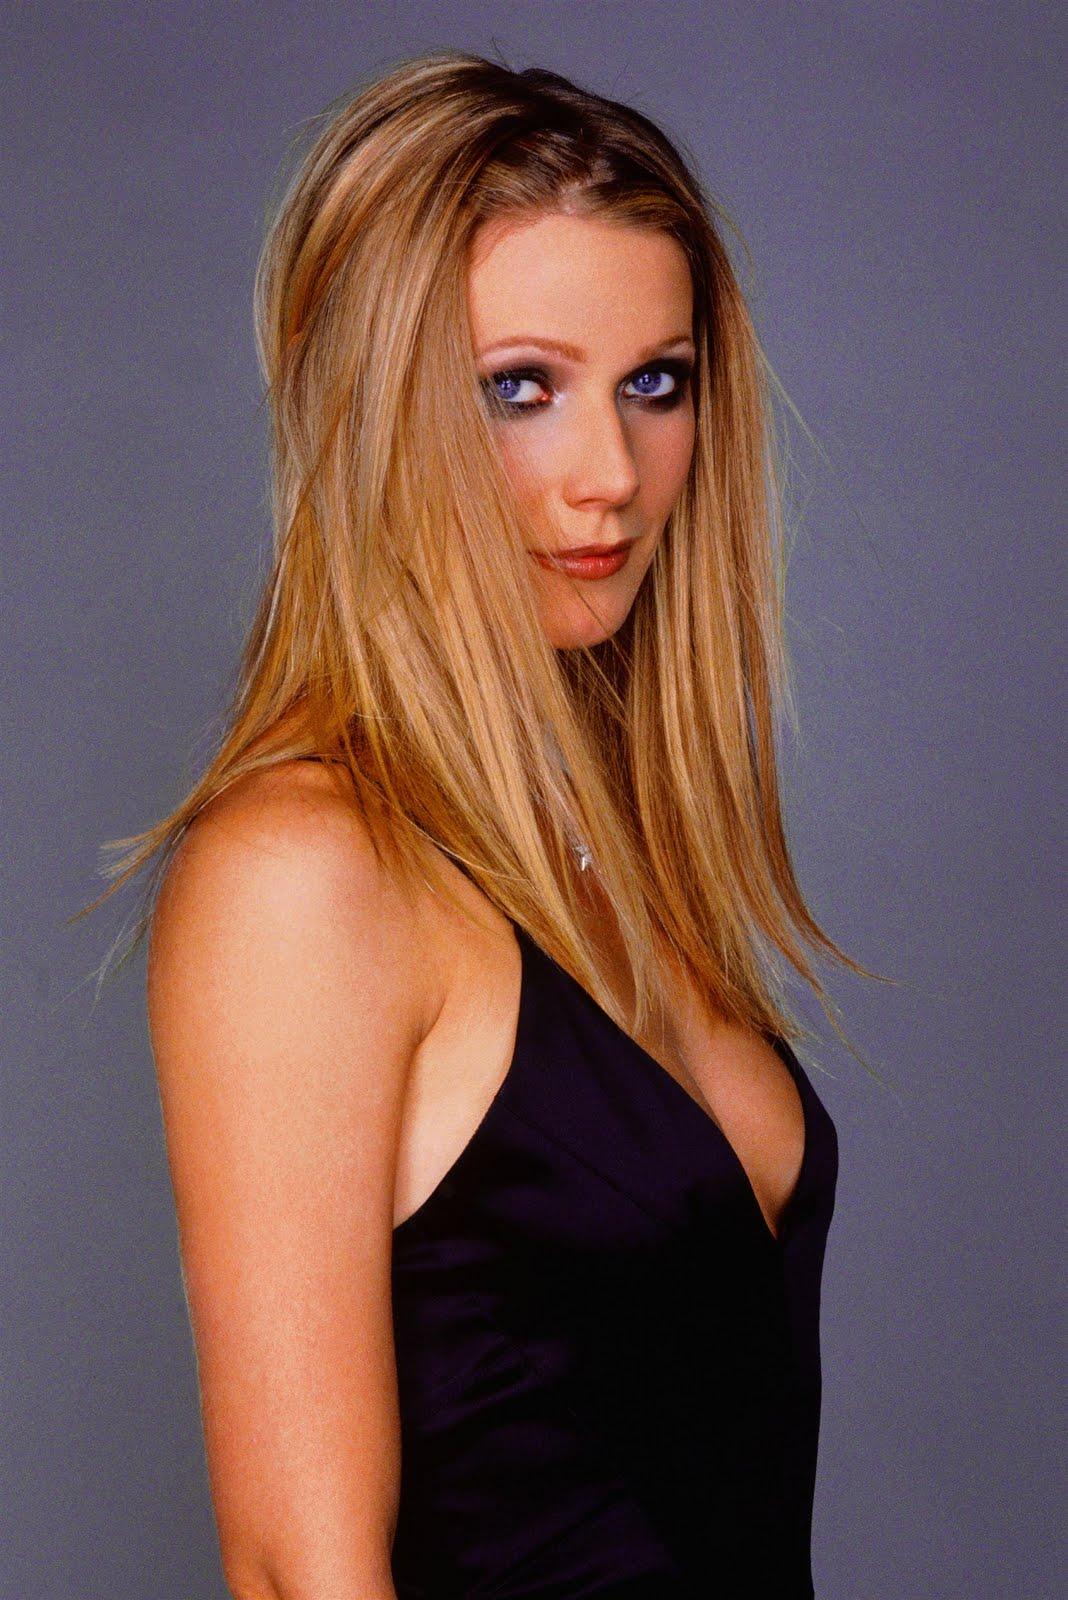 Nice And Famous Gwyneth Paltrow-4846